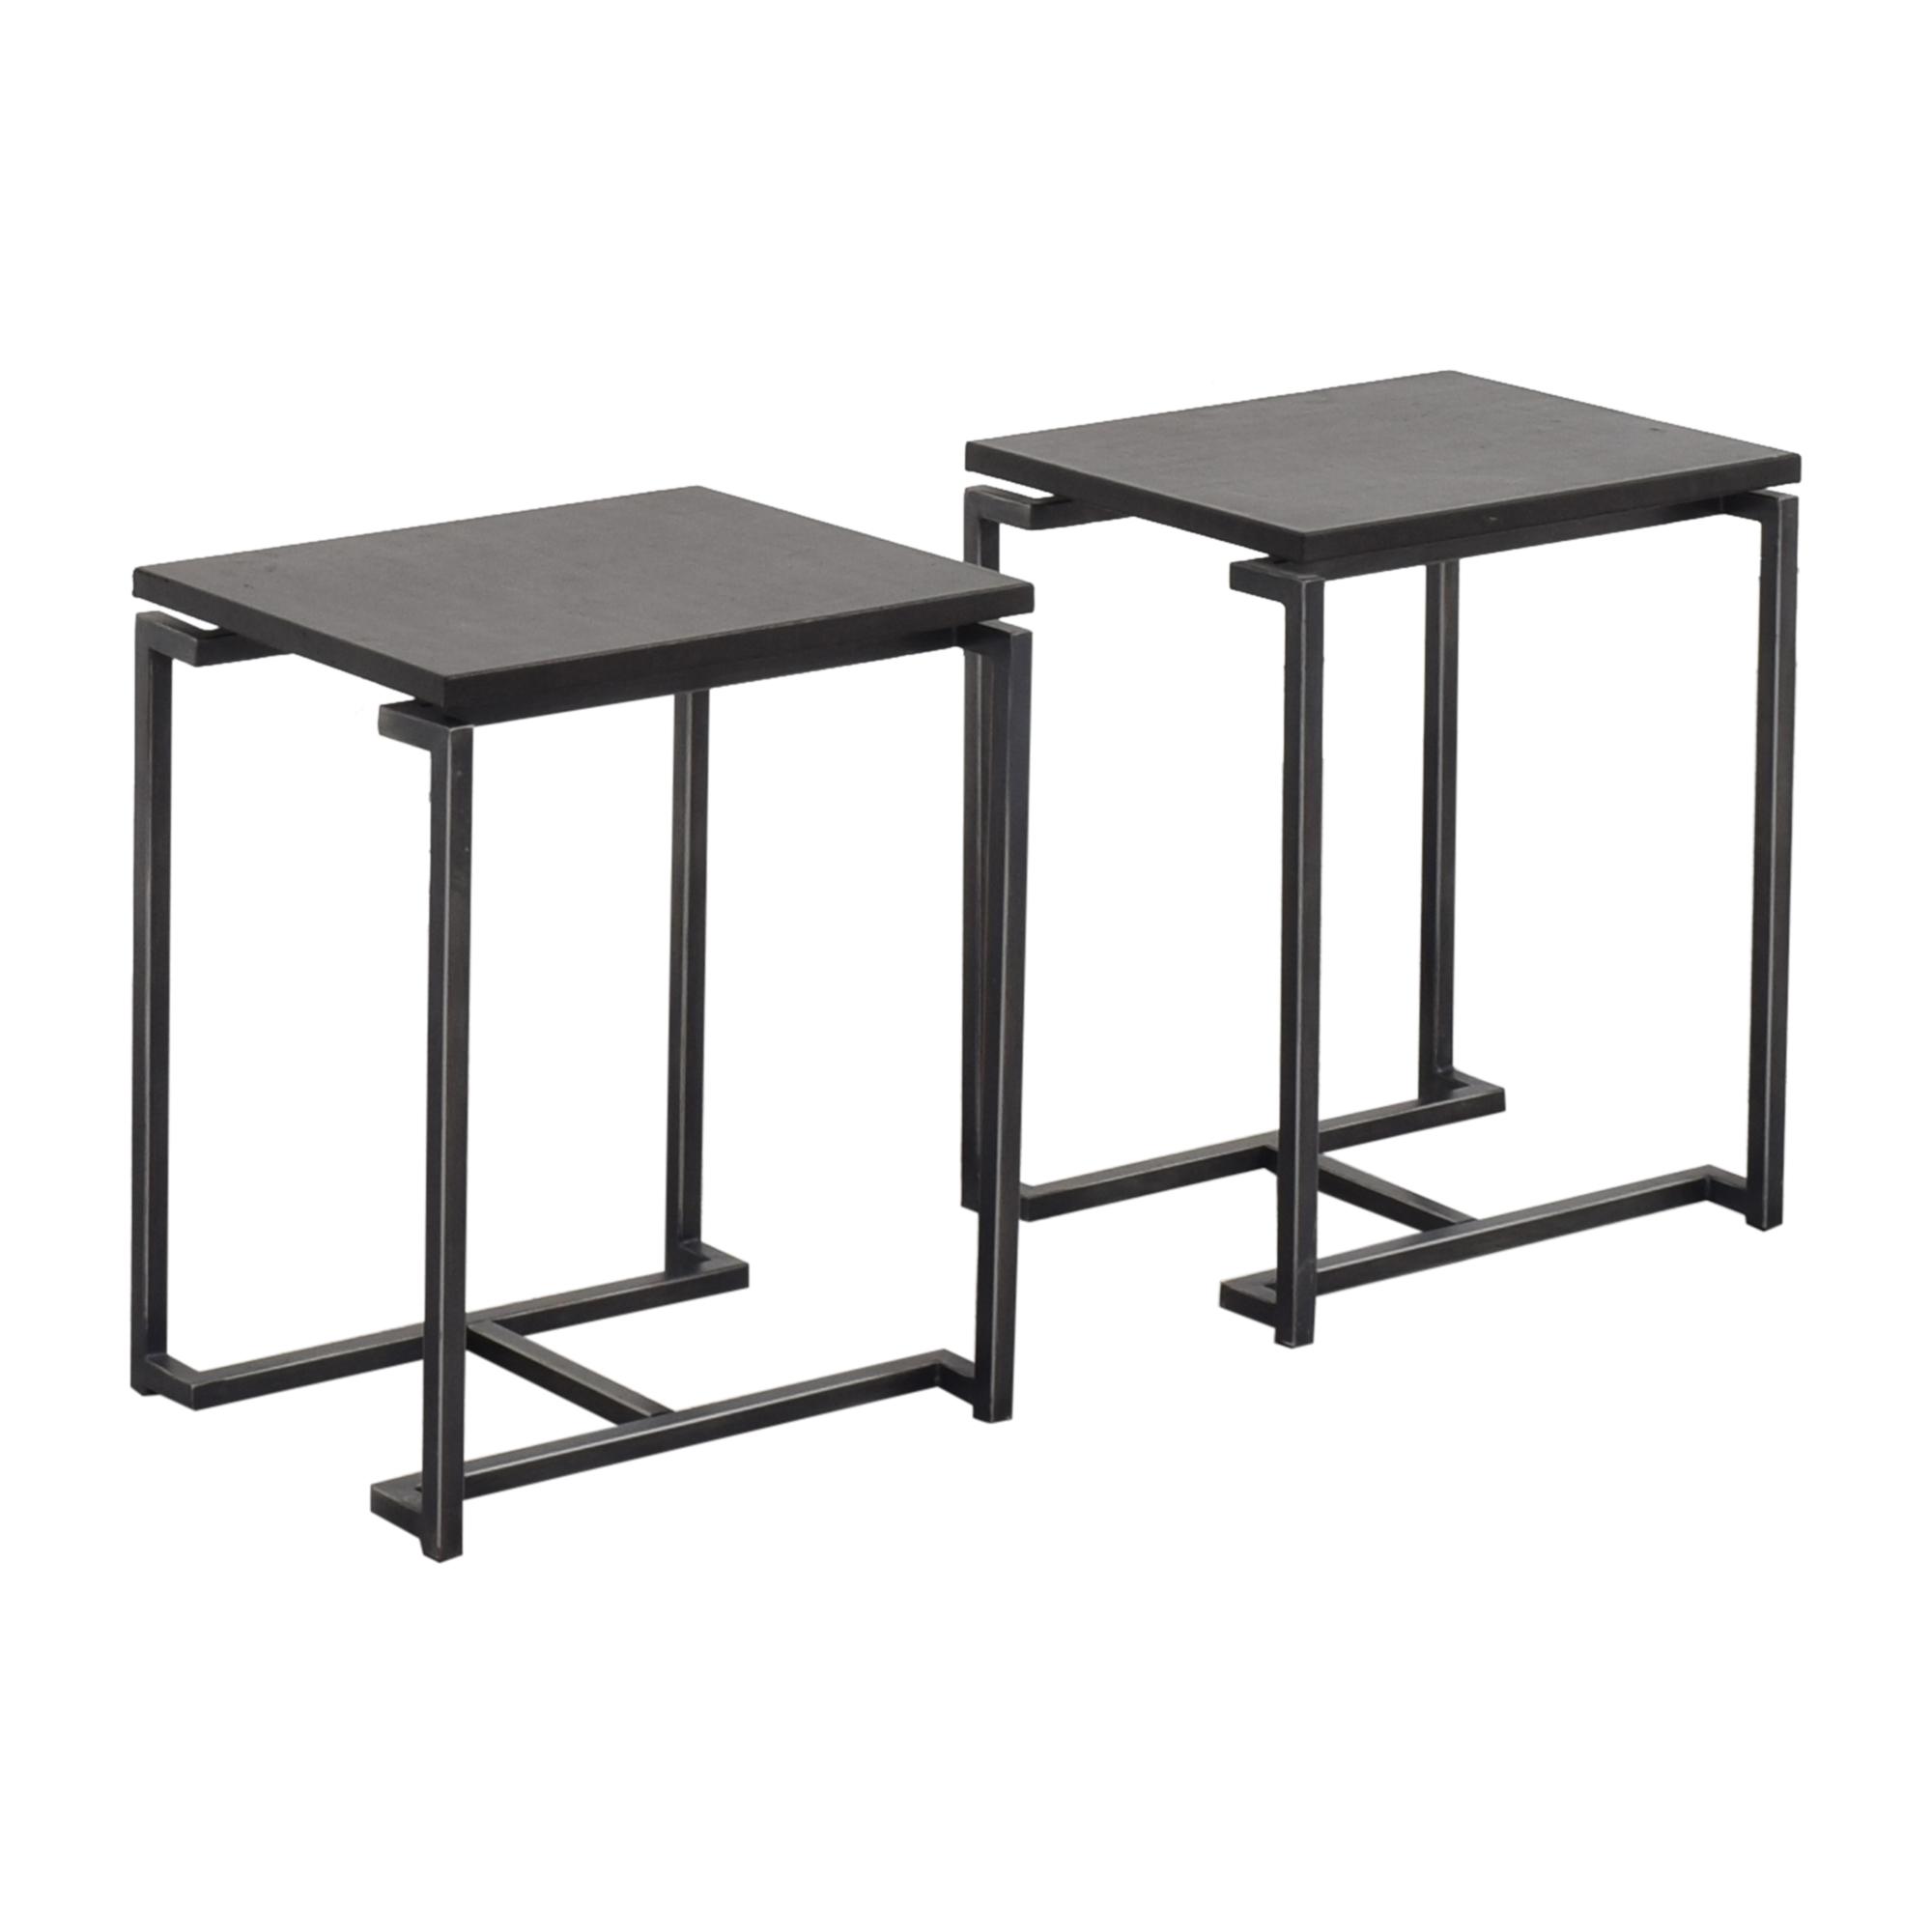 West Elm West Elm Modern End Tables used